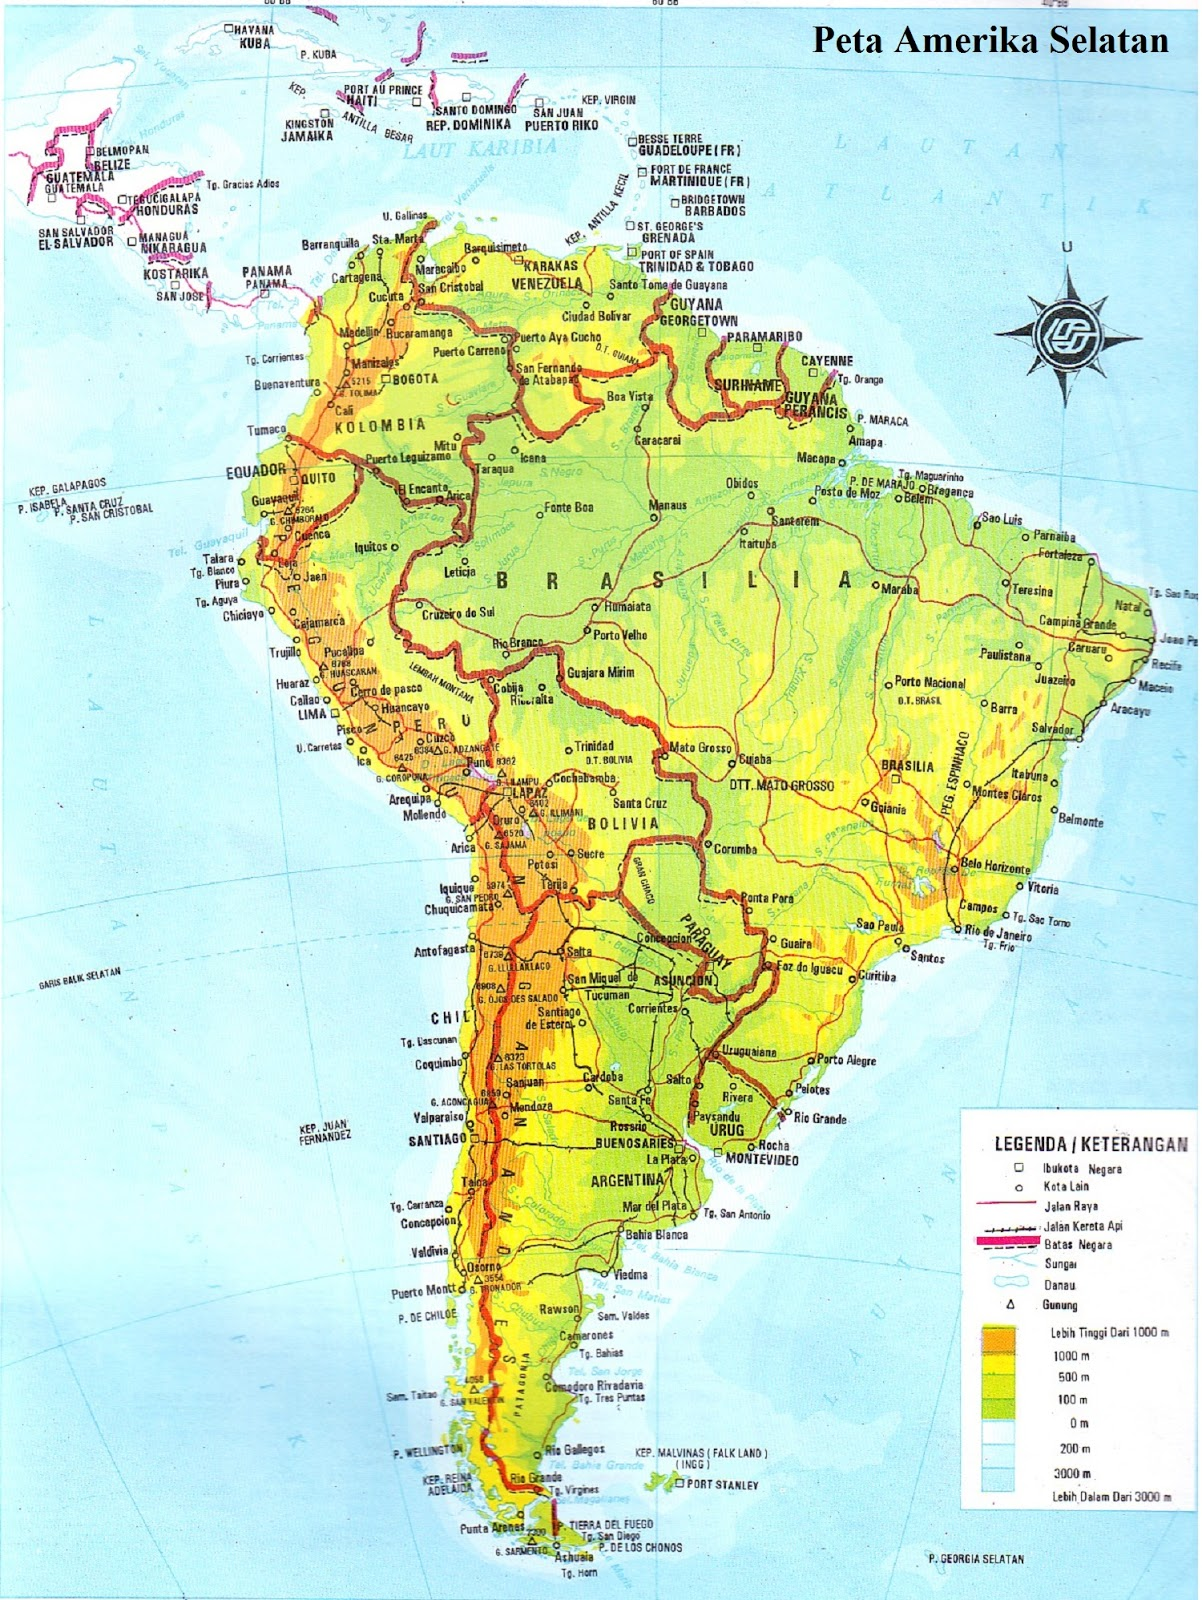 Peta Amerika Selatan